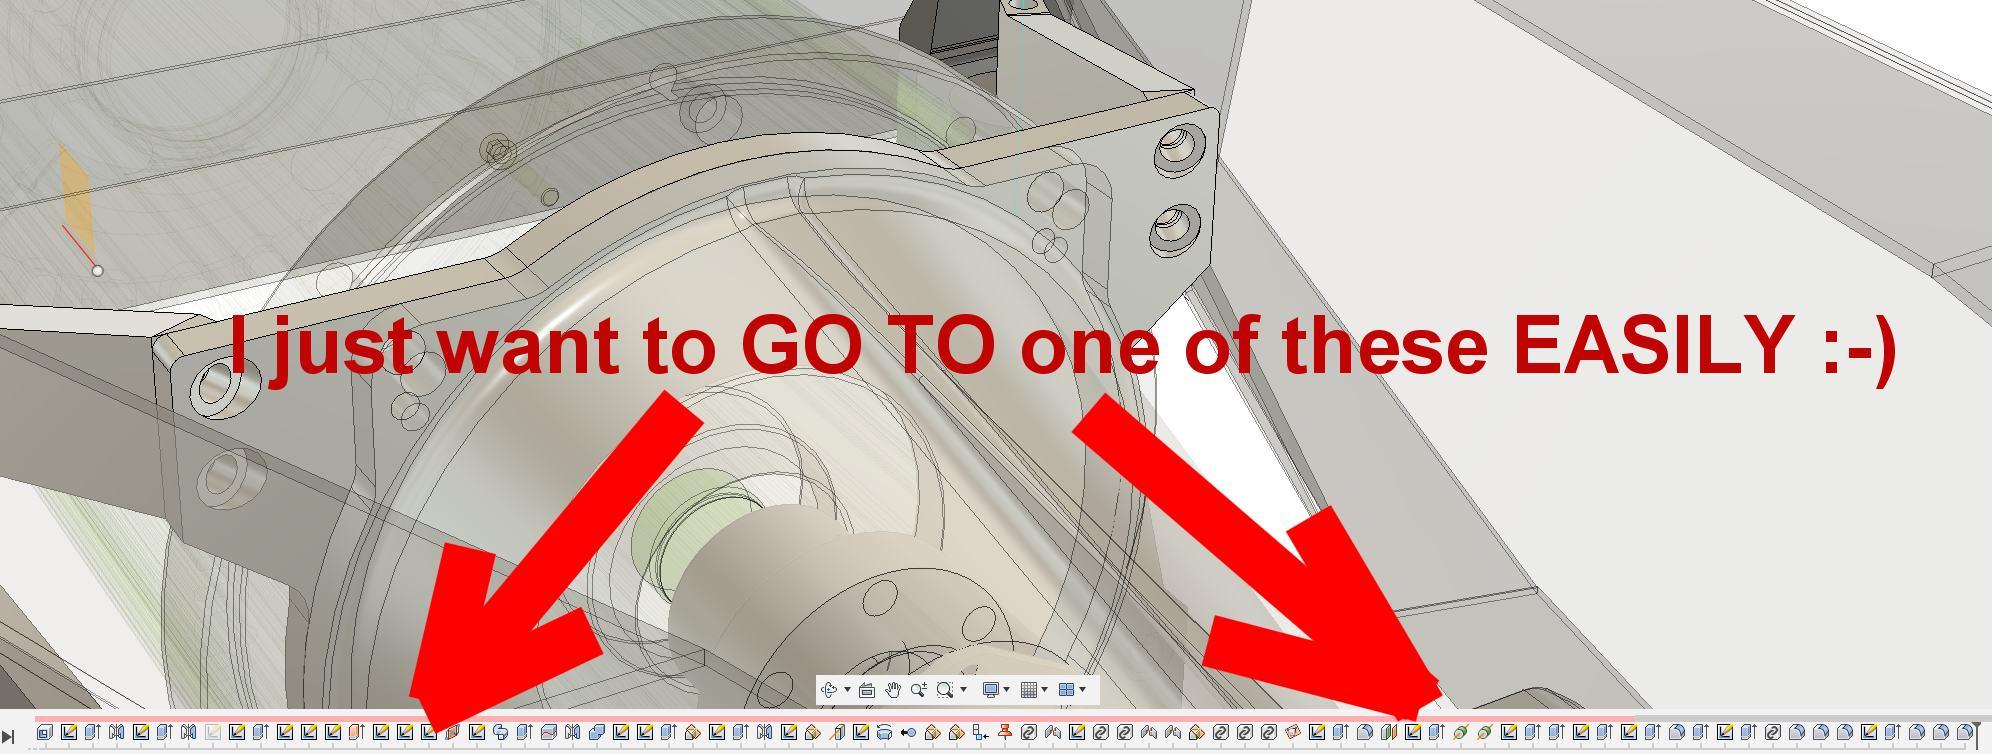 Fusion 360 IdeaStation - Page 3 - Autodesk Community